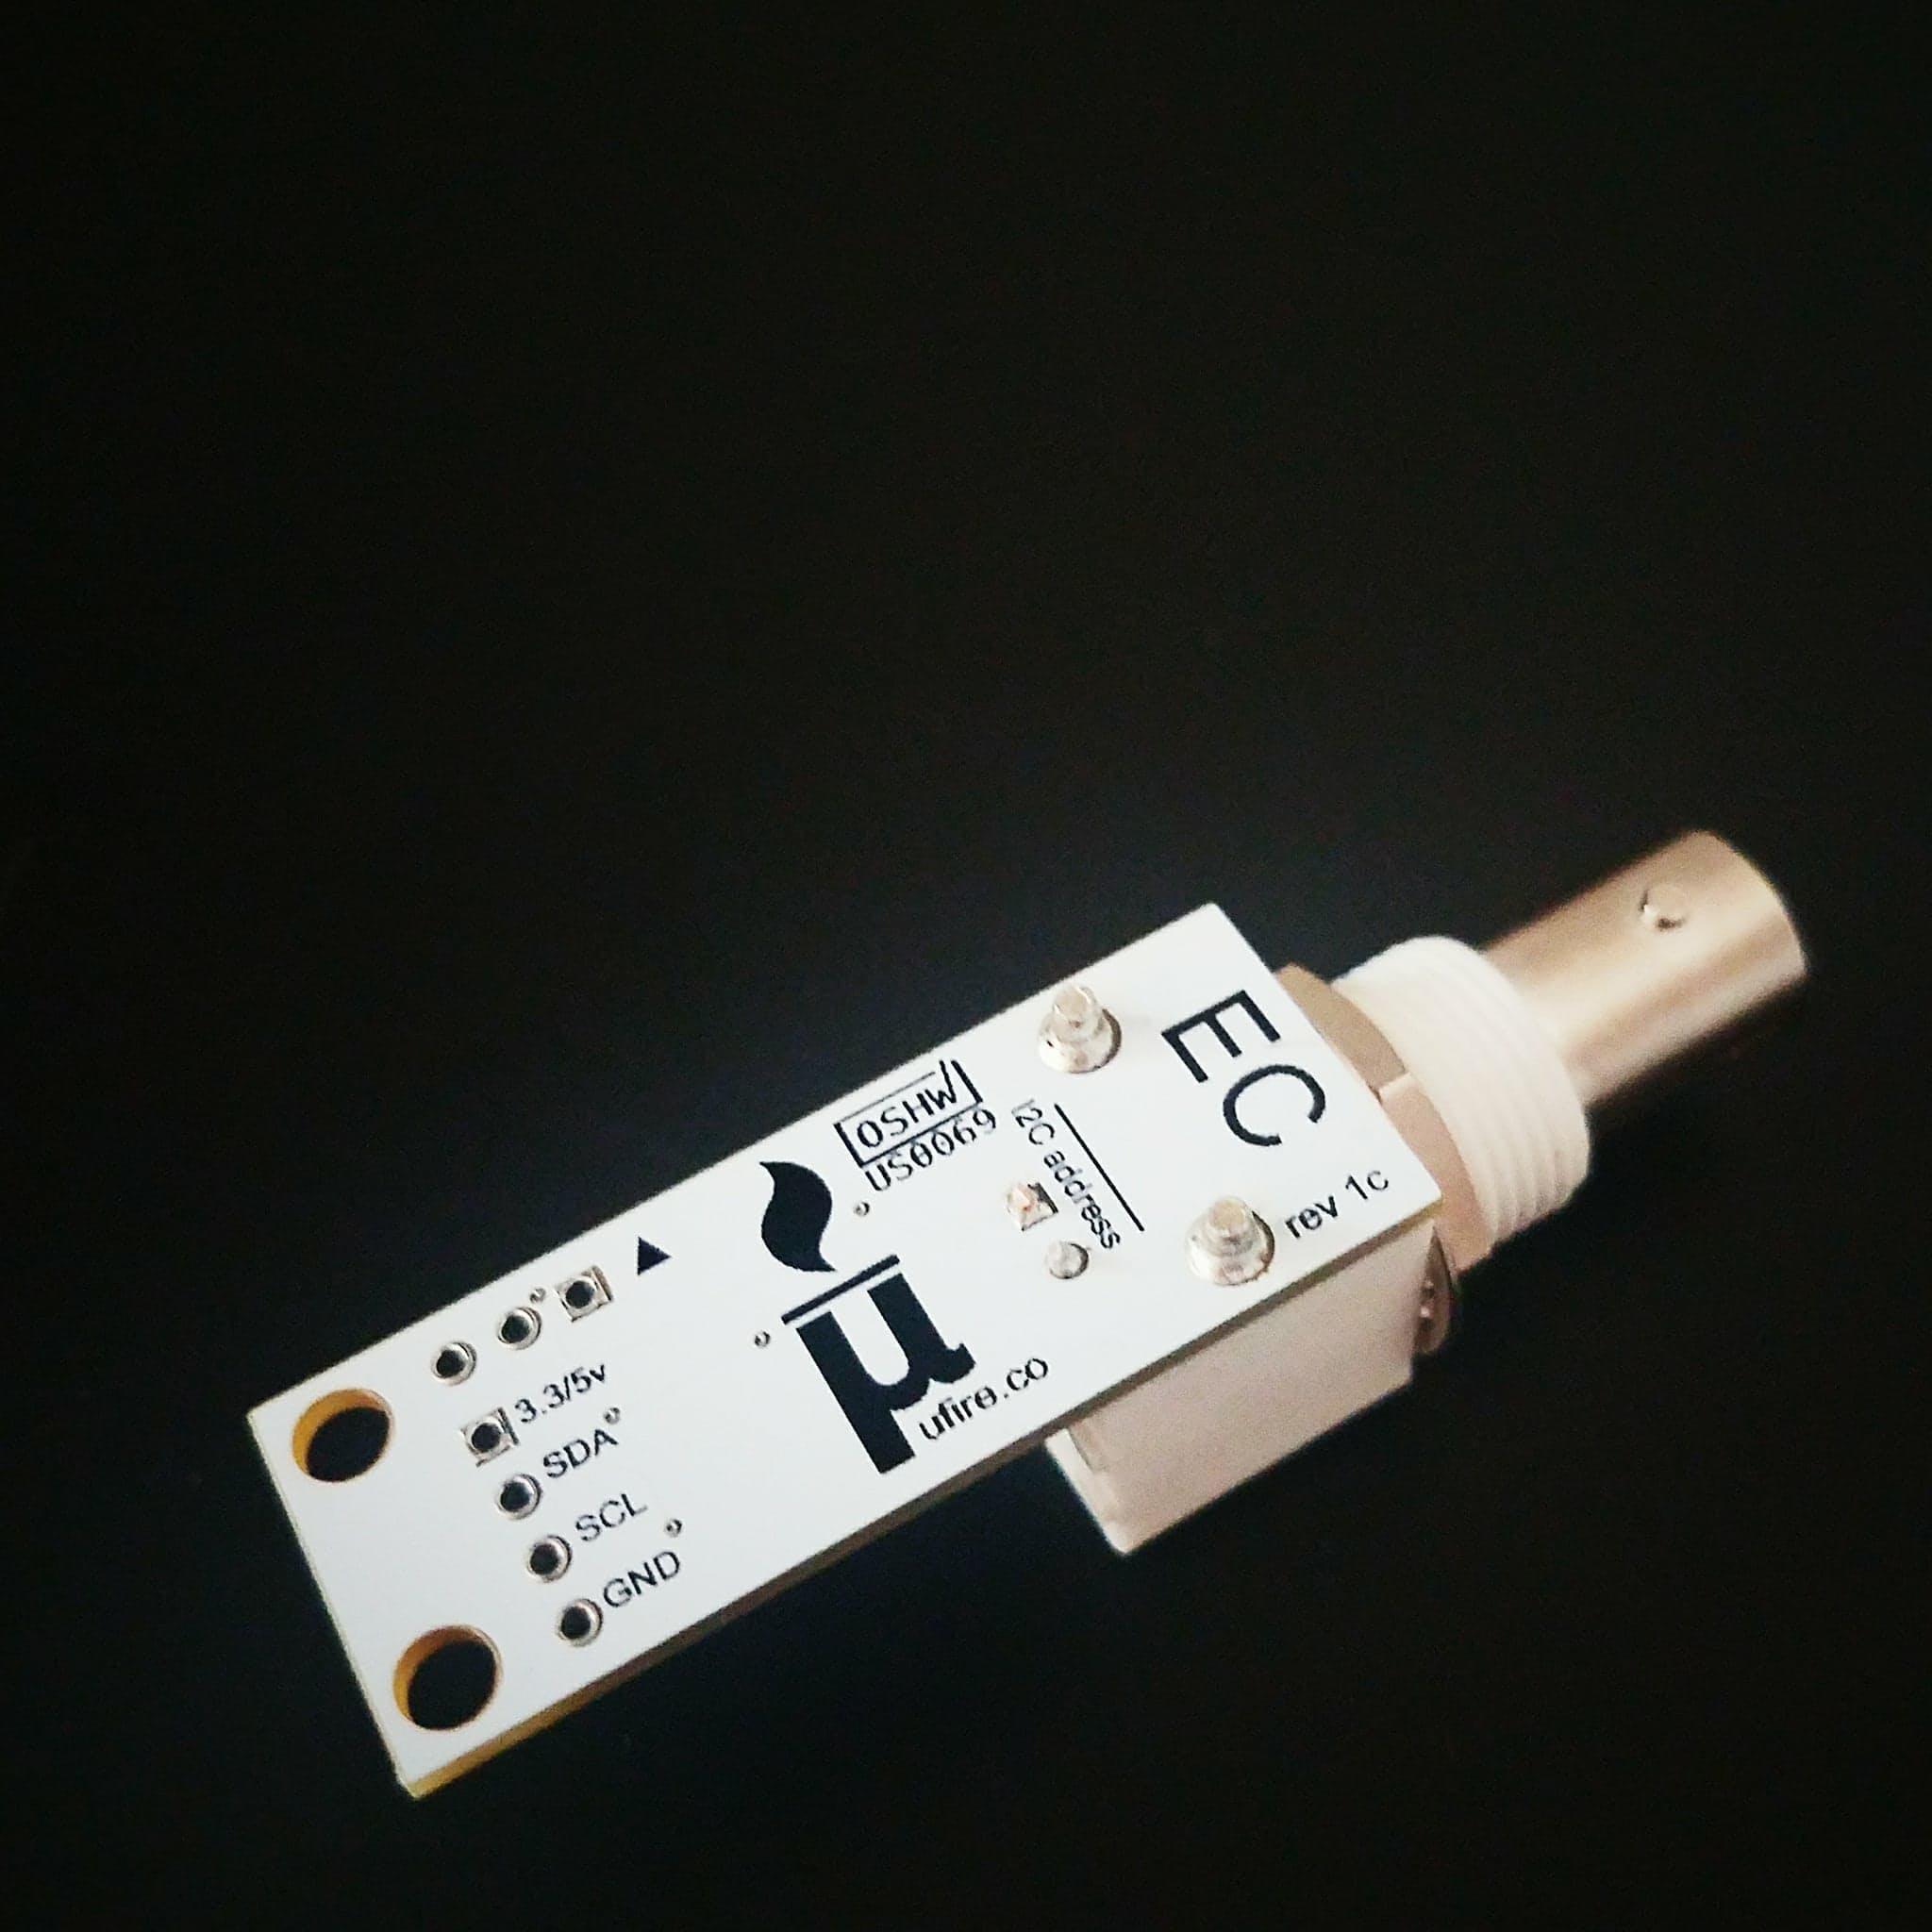 IoT Hydroponics - Measure EC